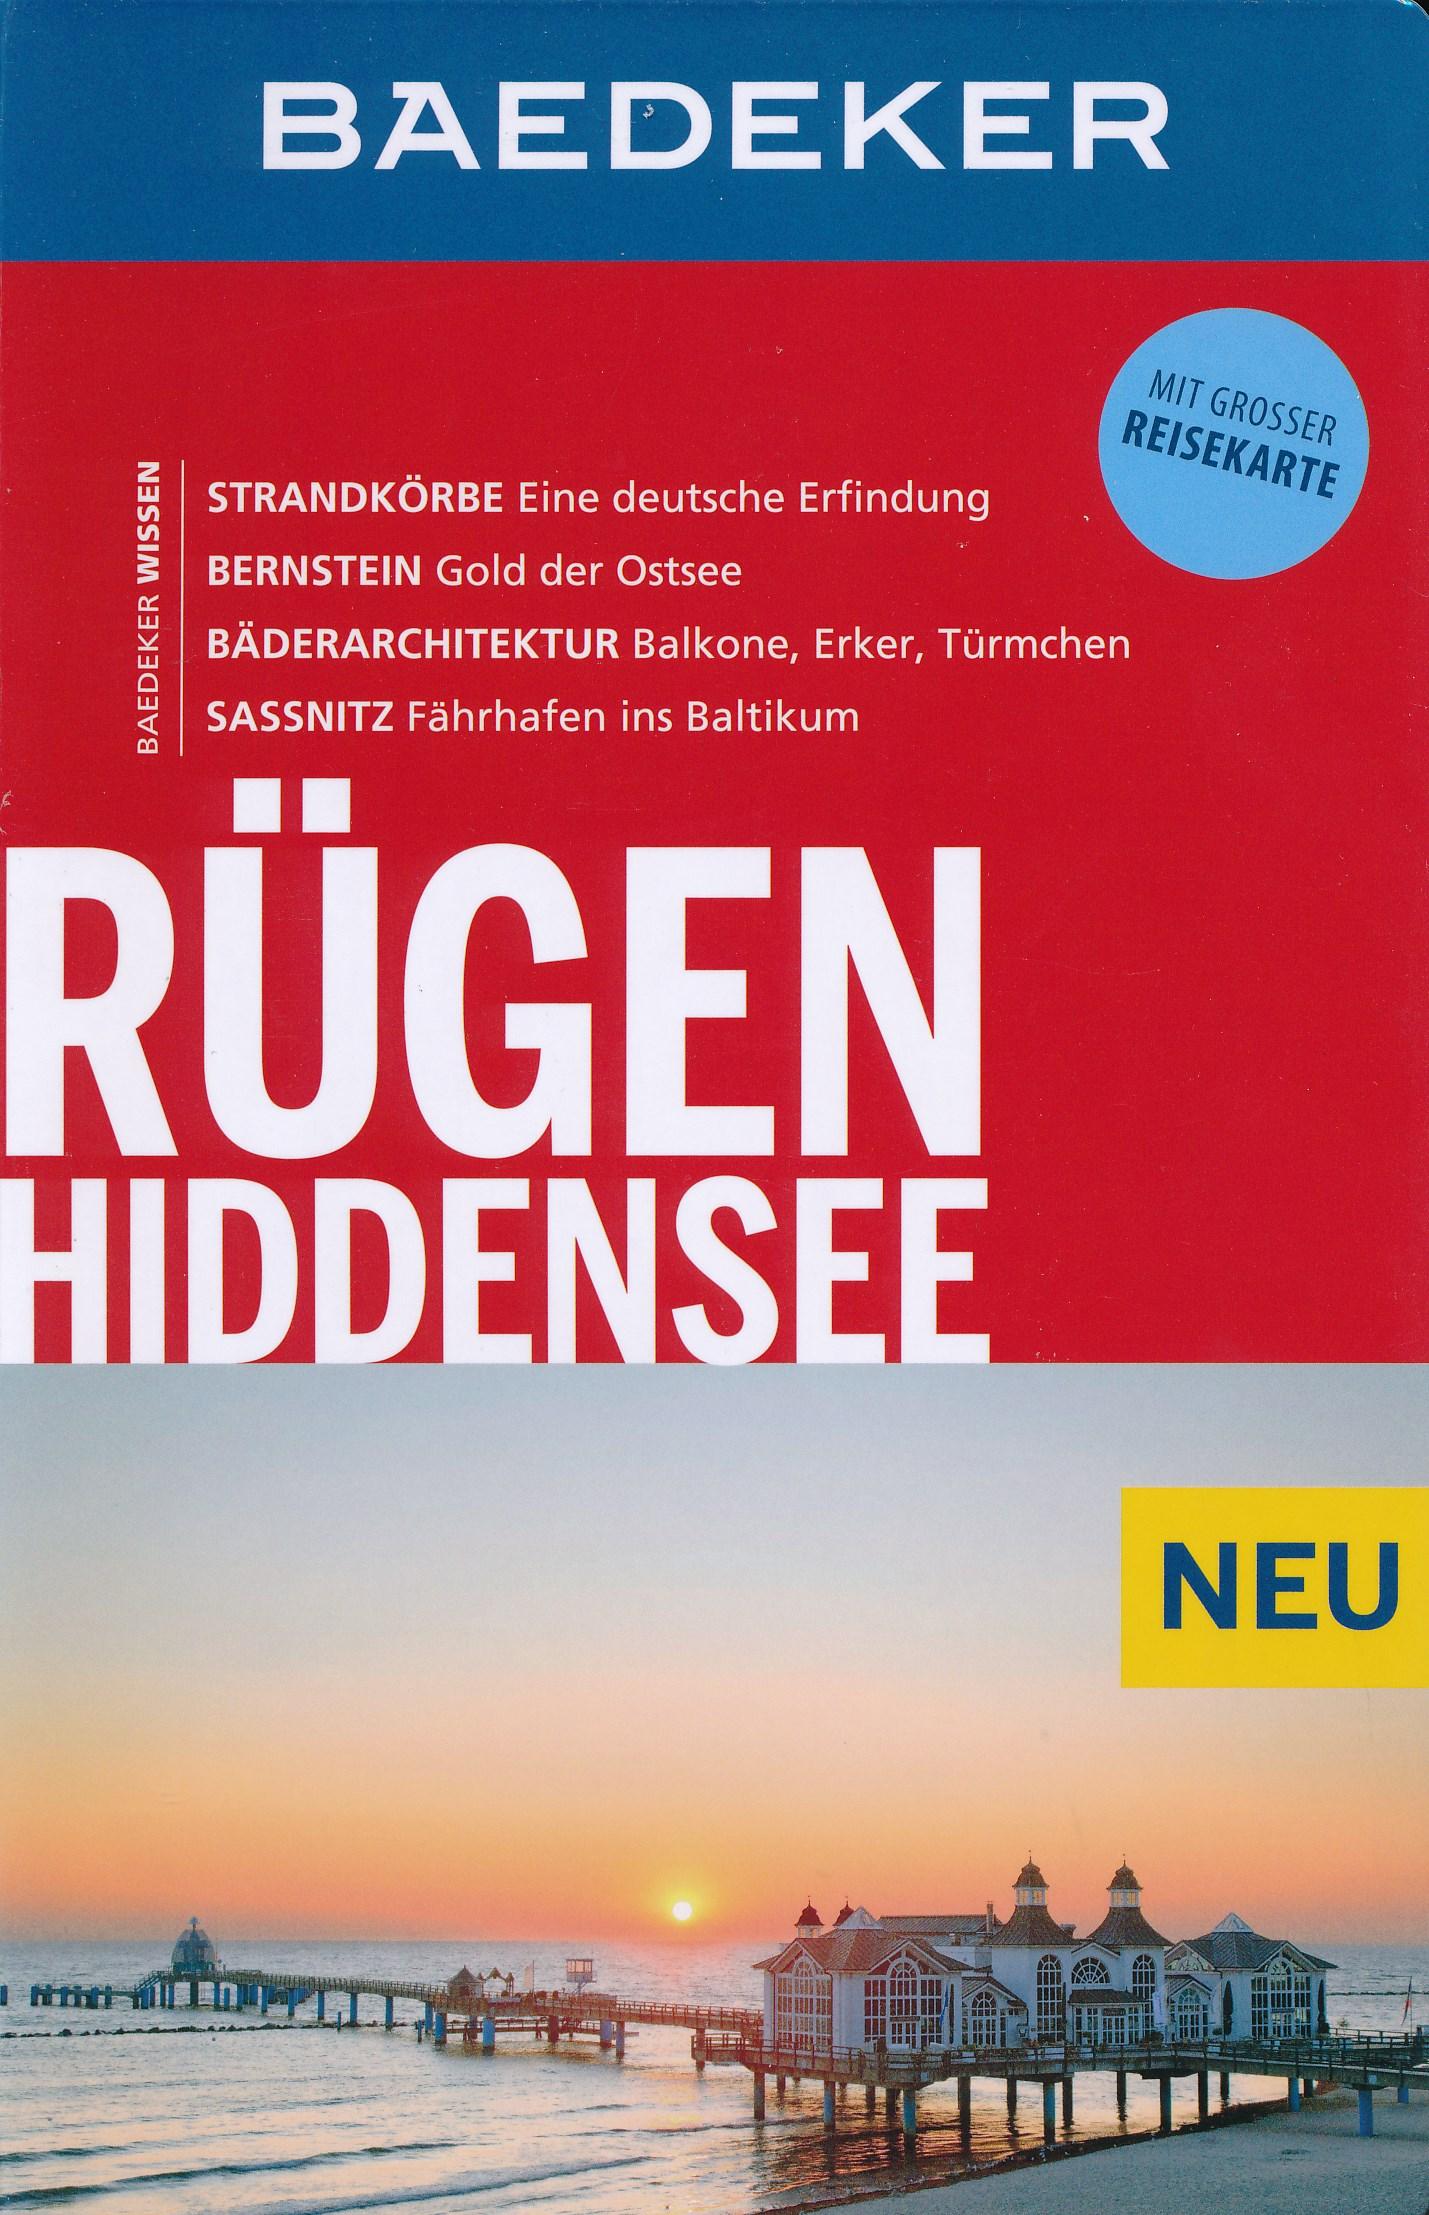 Reisgids Baedeker R�gen, Hiddensee   Baedeker Allianz Reisef�hrer